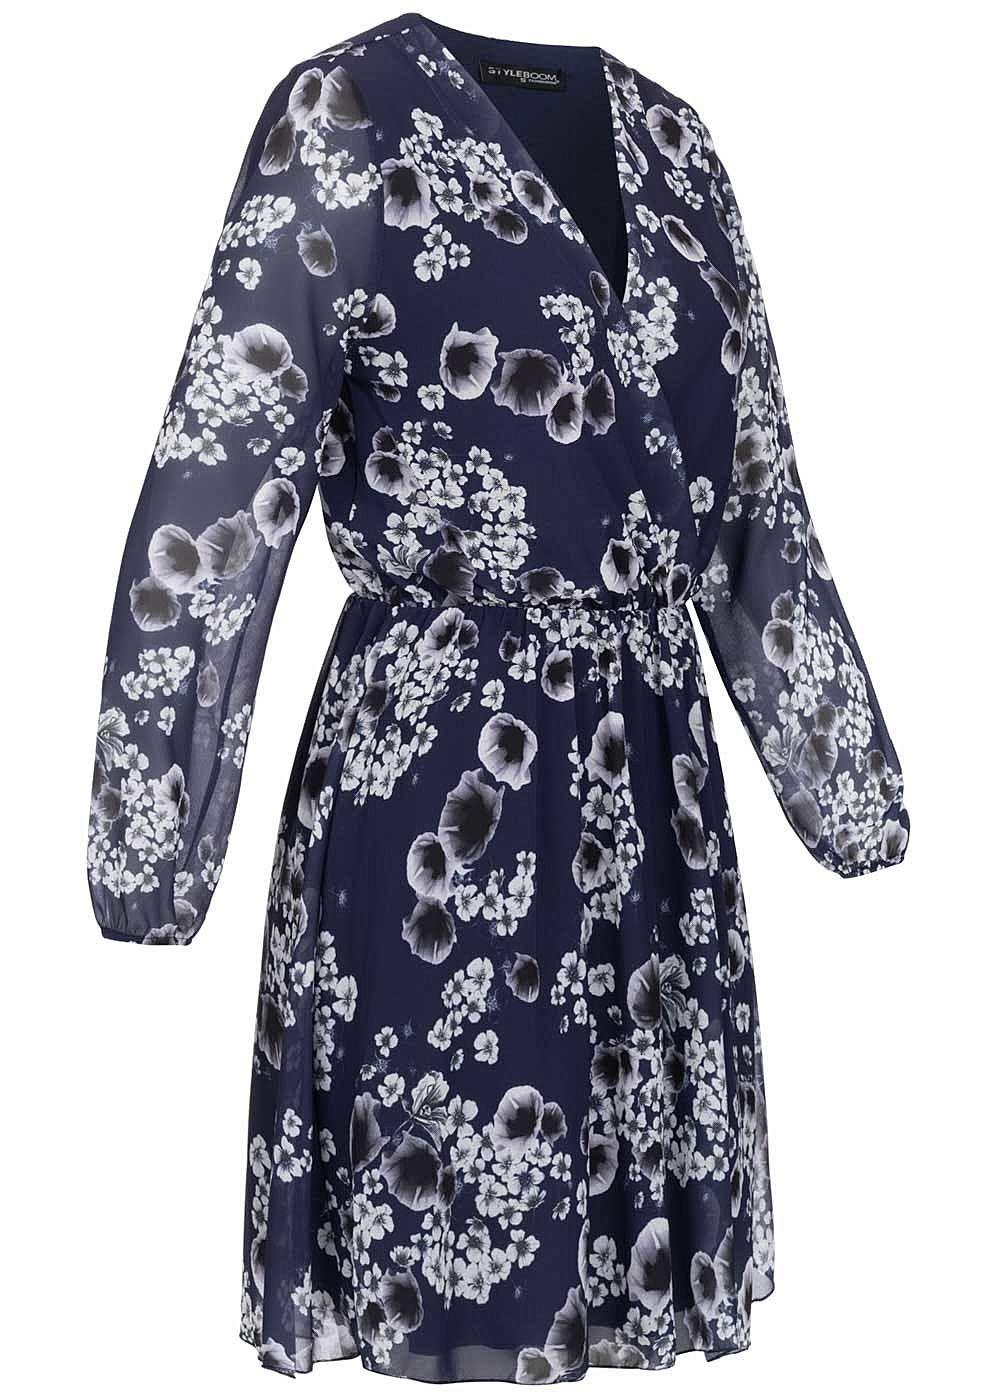 styleboom fashion damen v-neck chiffon mini kleid blumen print navy blau